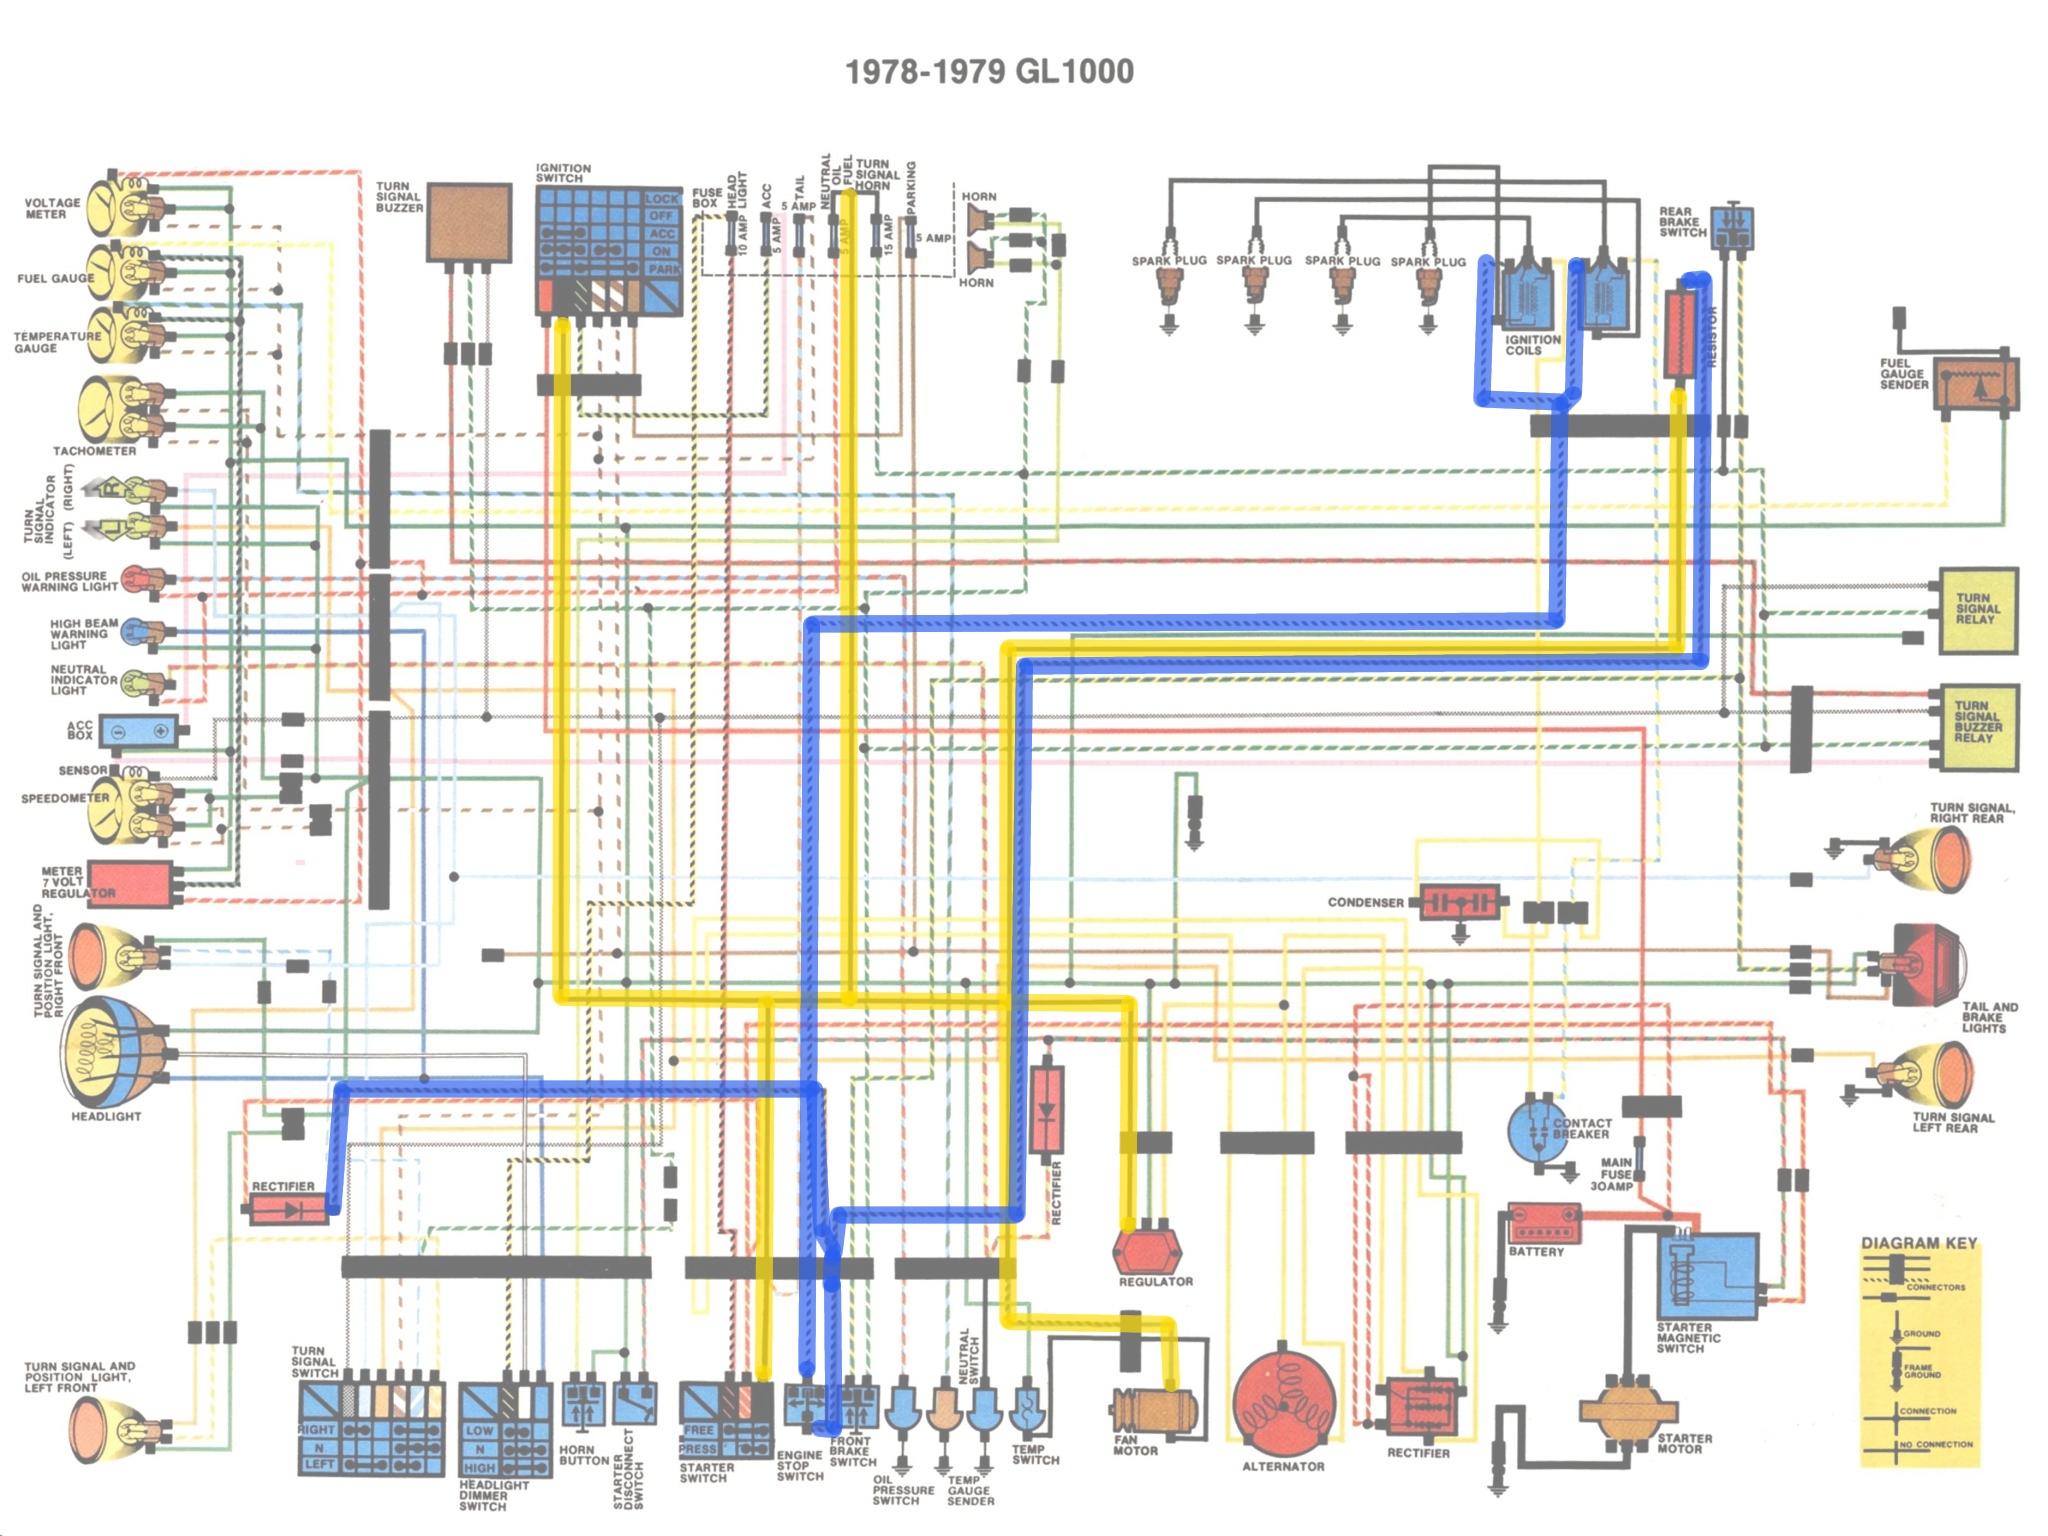 Ktm 950 Supermoto Wiring Diagram Enthusiast Diagrams Duke 125 990 Smt Electrical House U2022 Rh Universalservices Co 2008